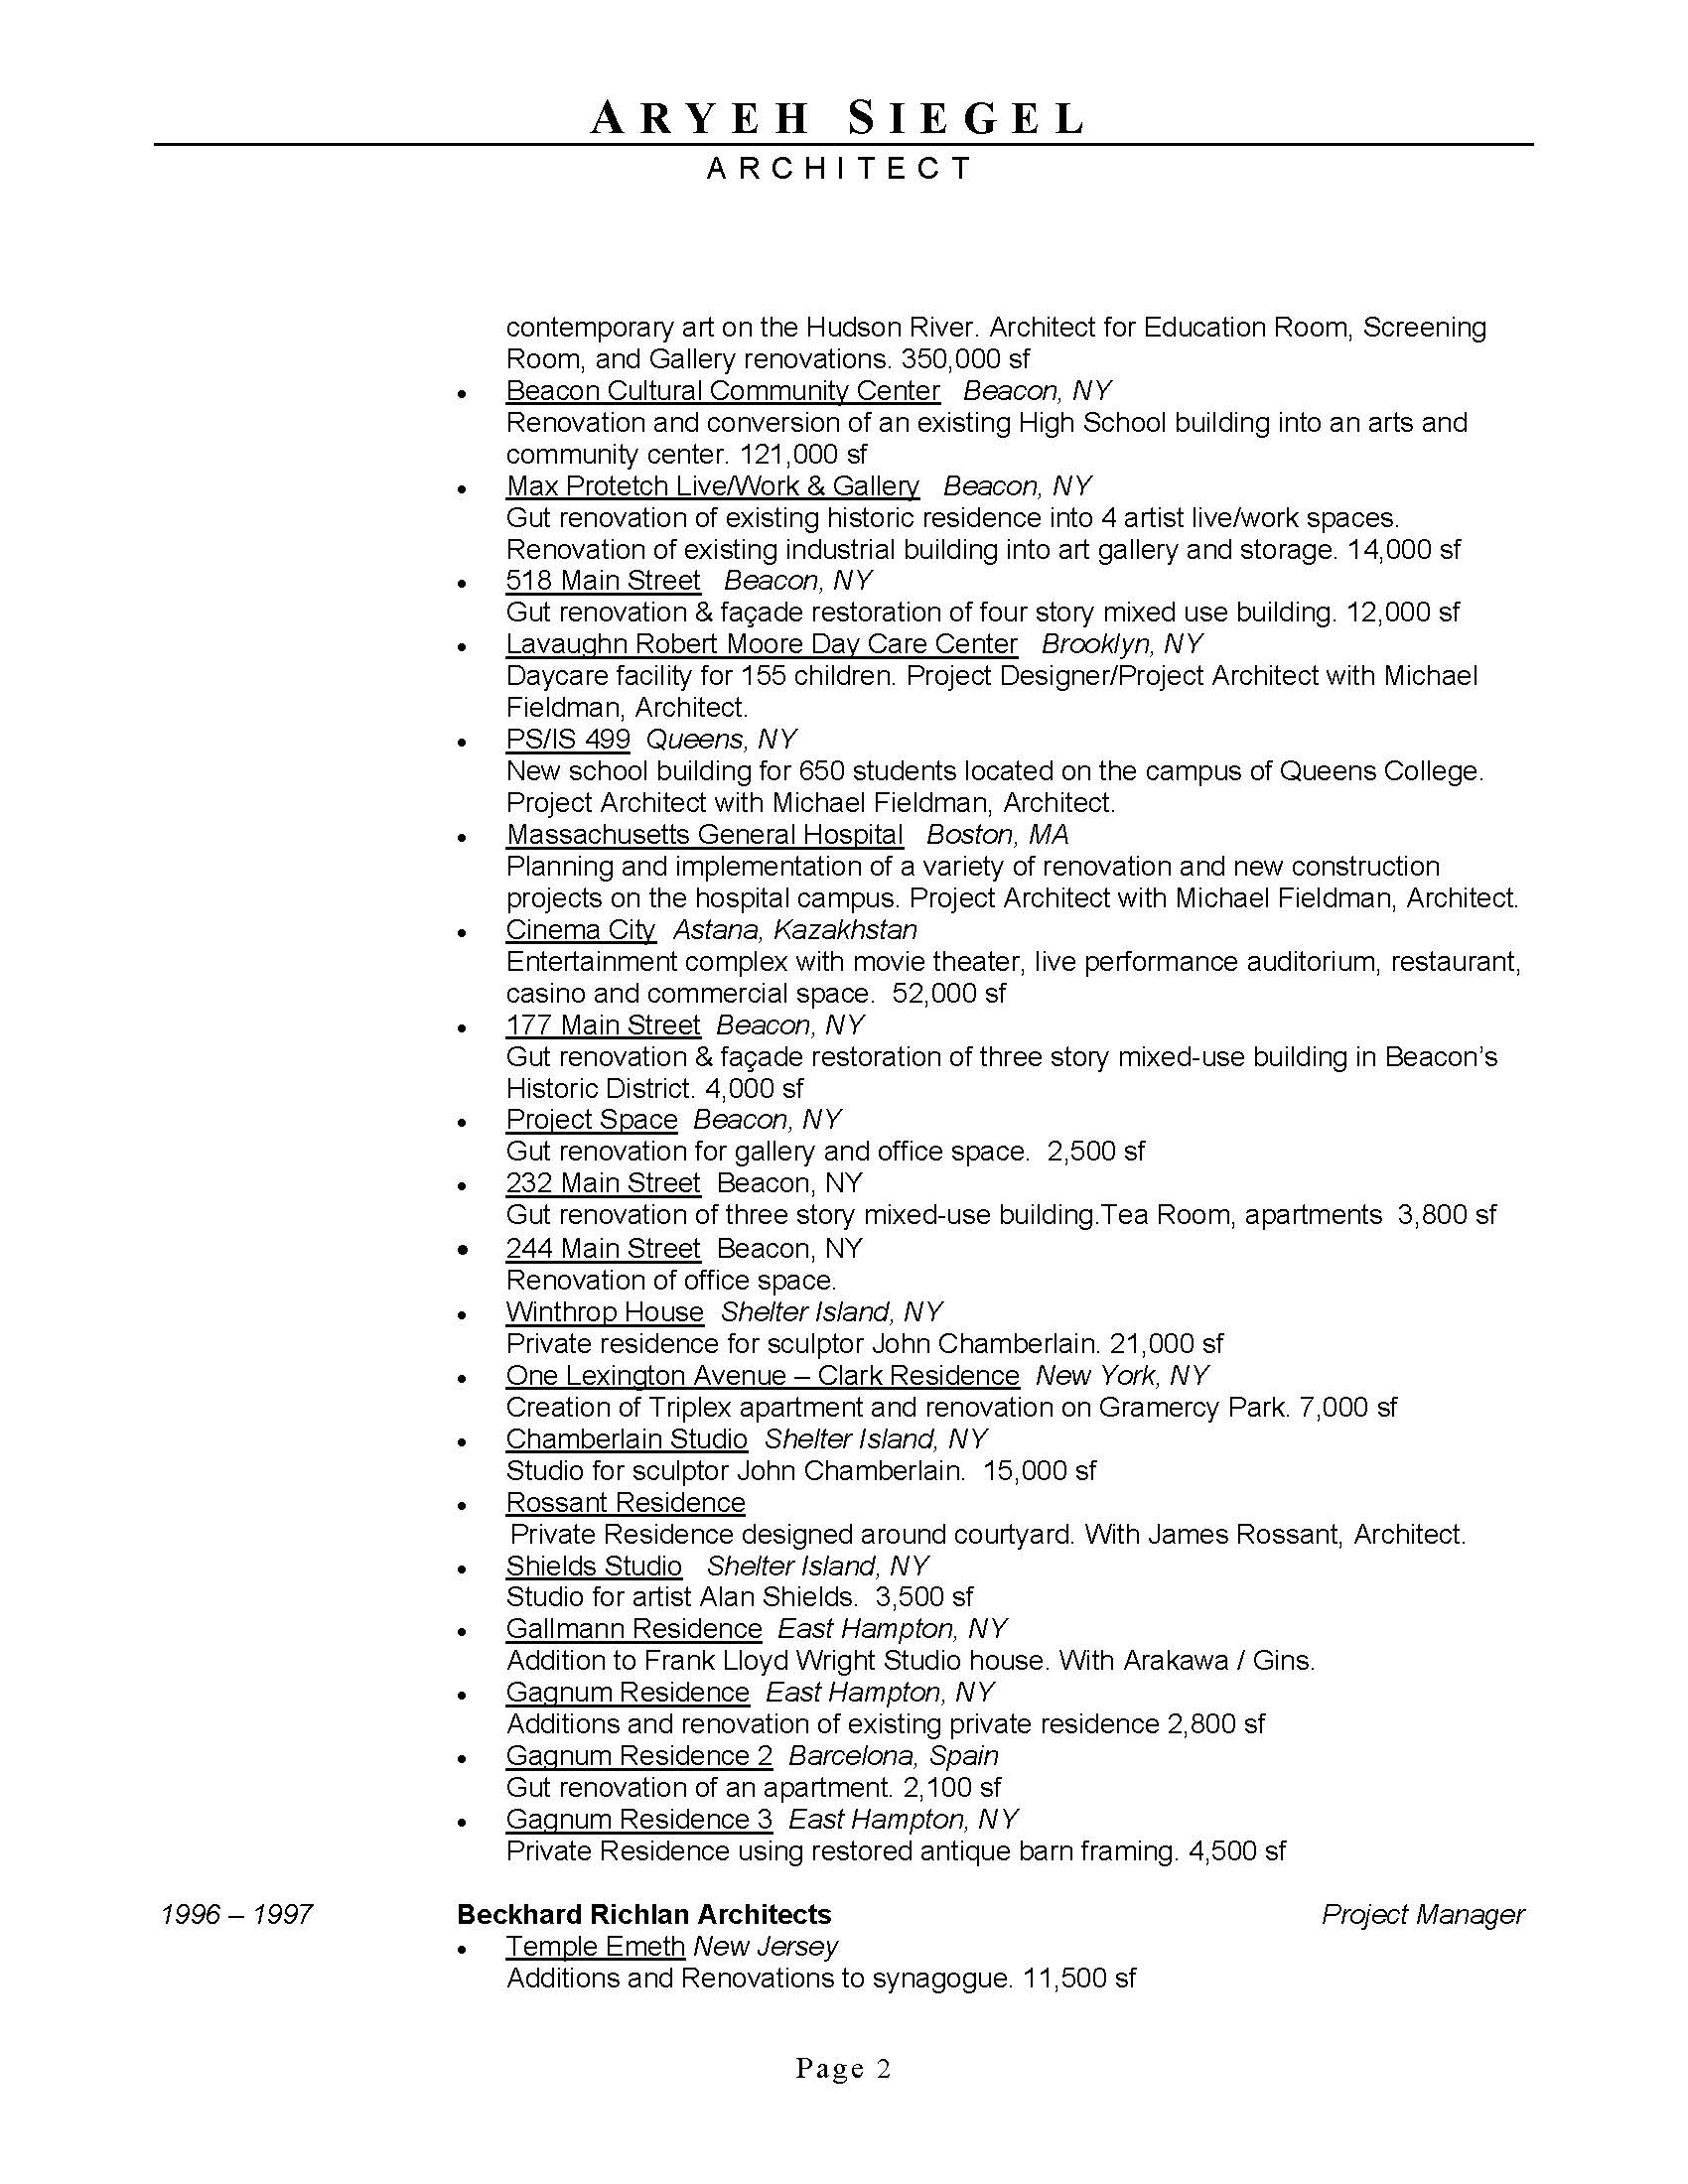 Master Resume_130725_Page_2.jpg